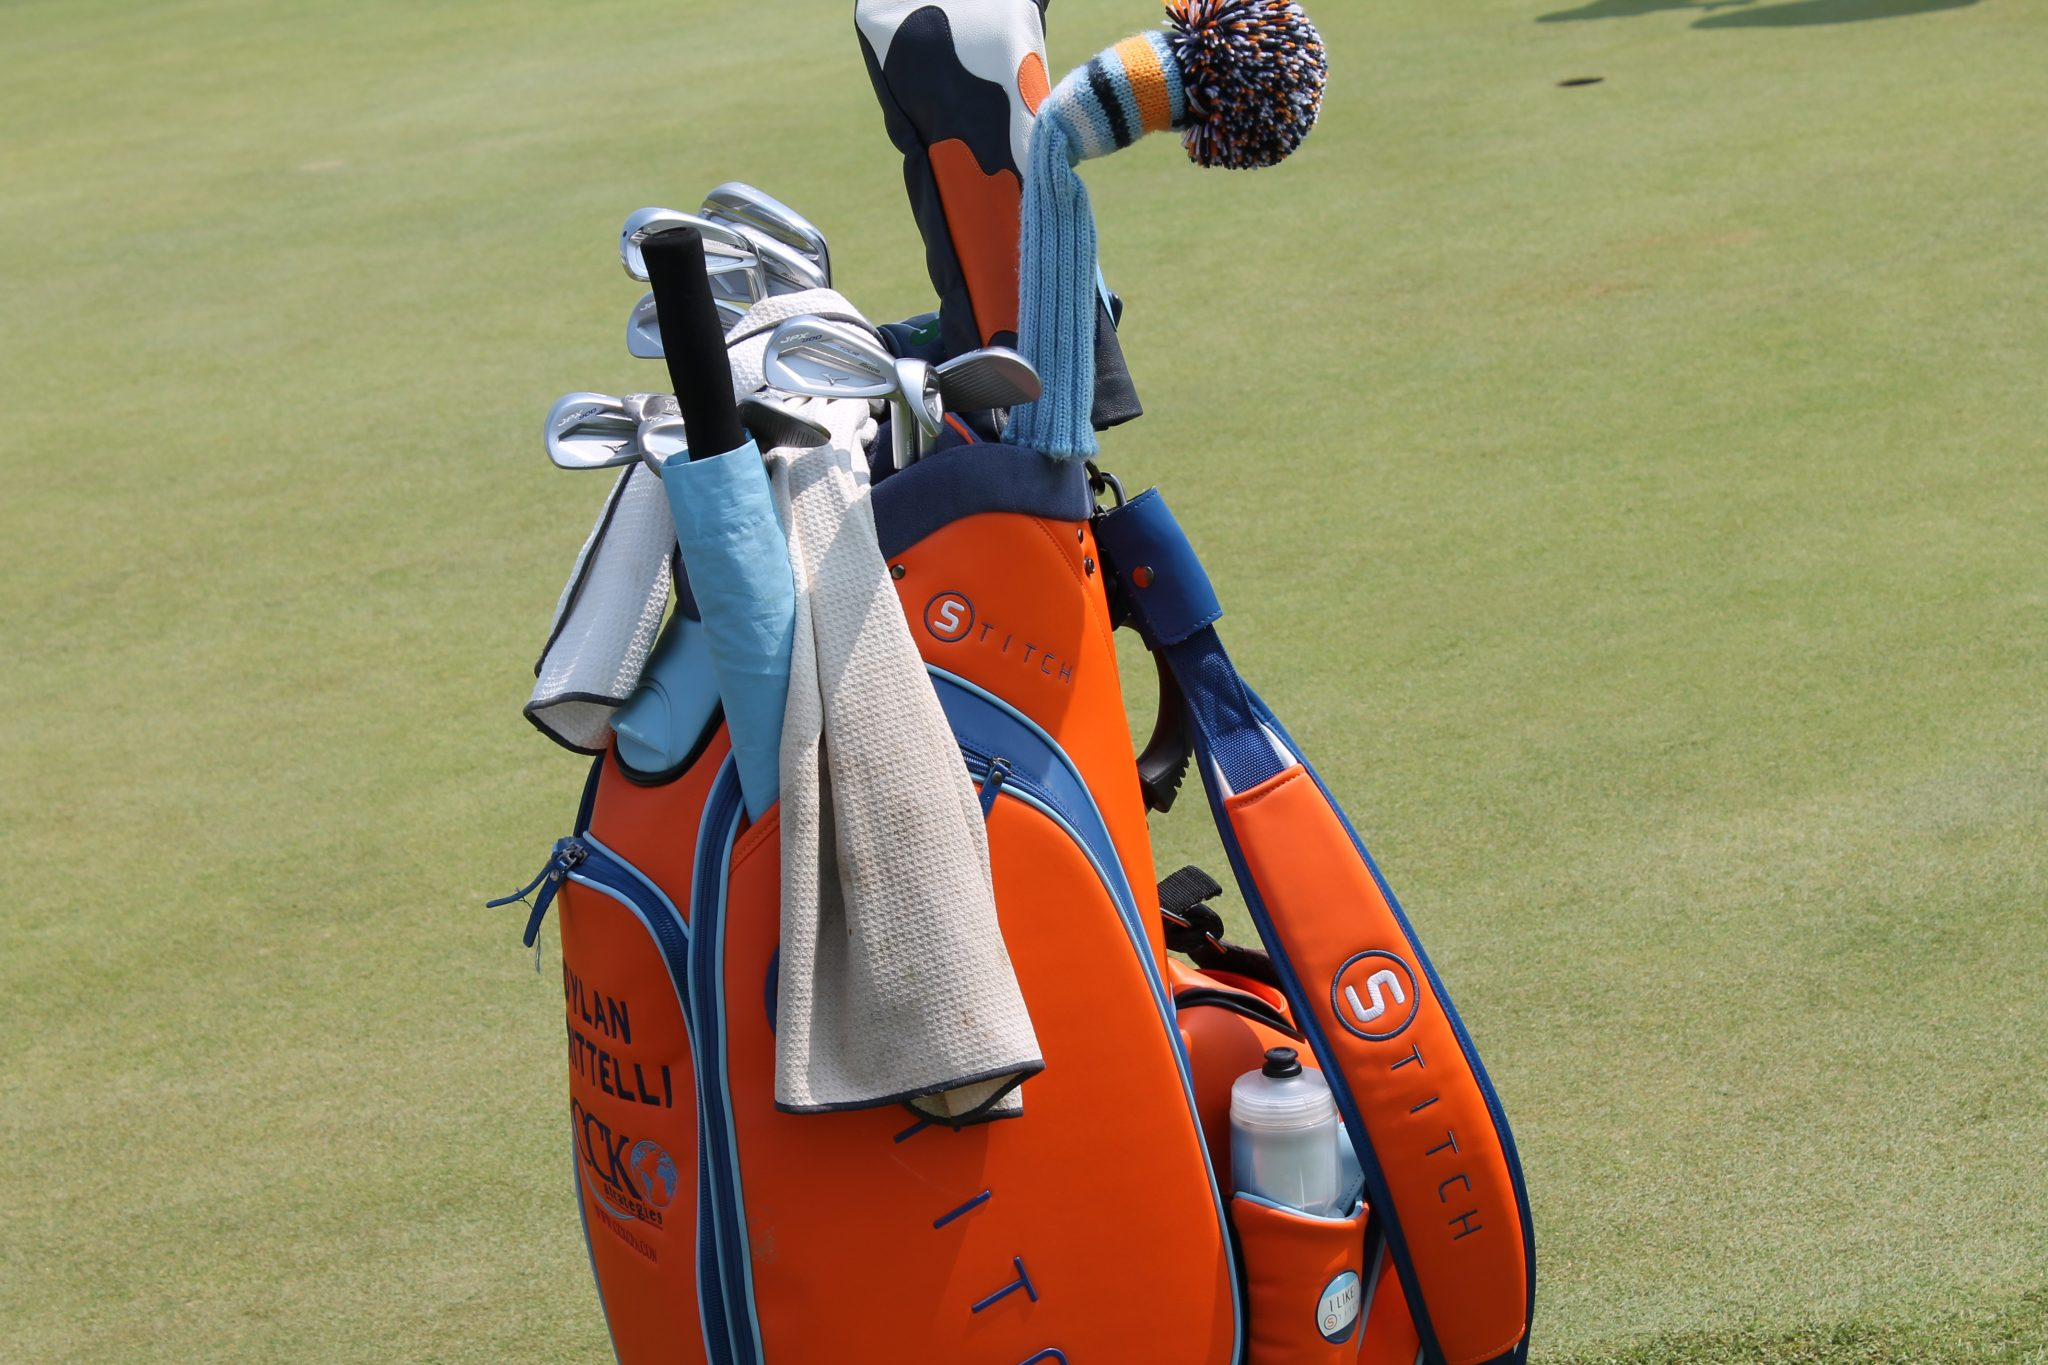 Dillan Frittelly's golf bag